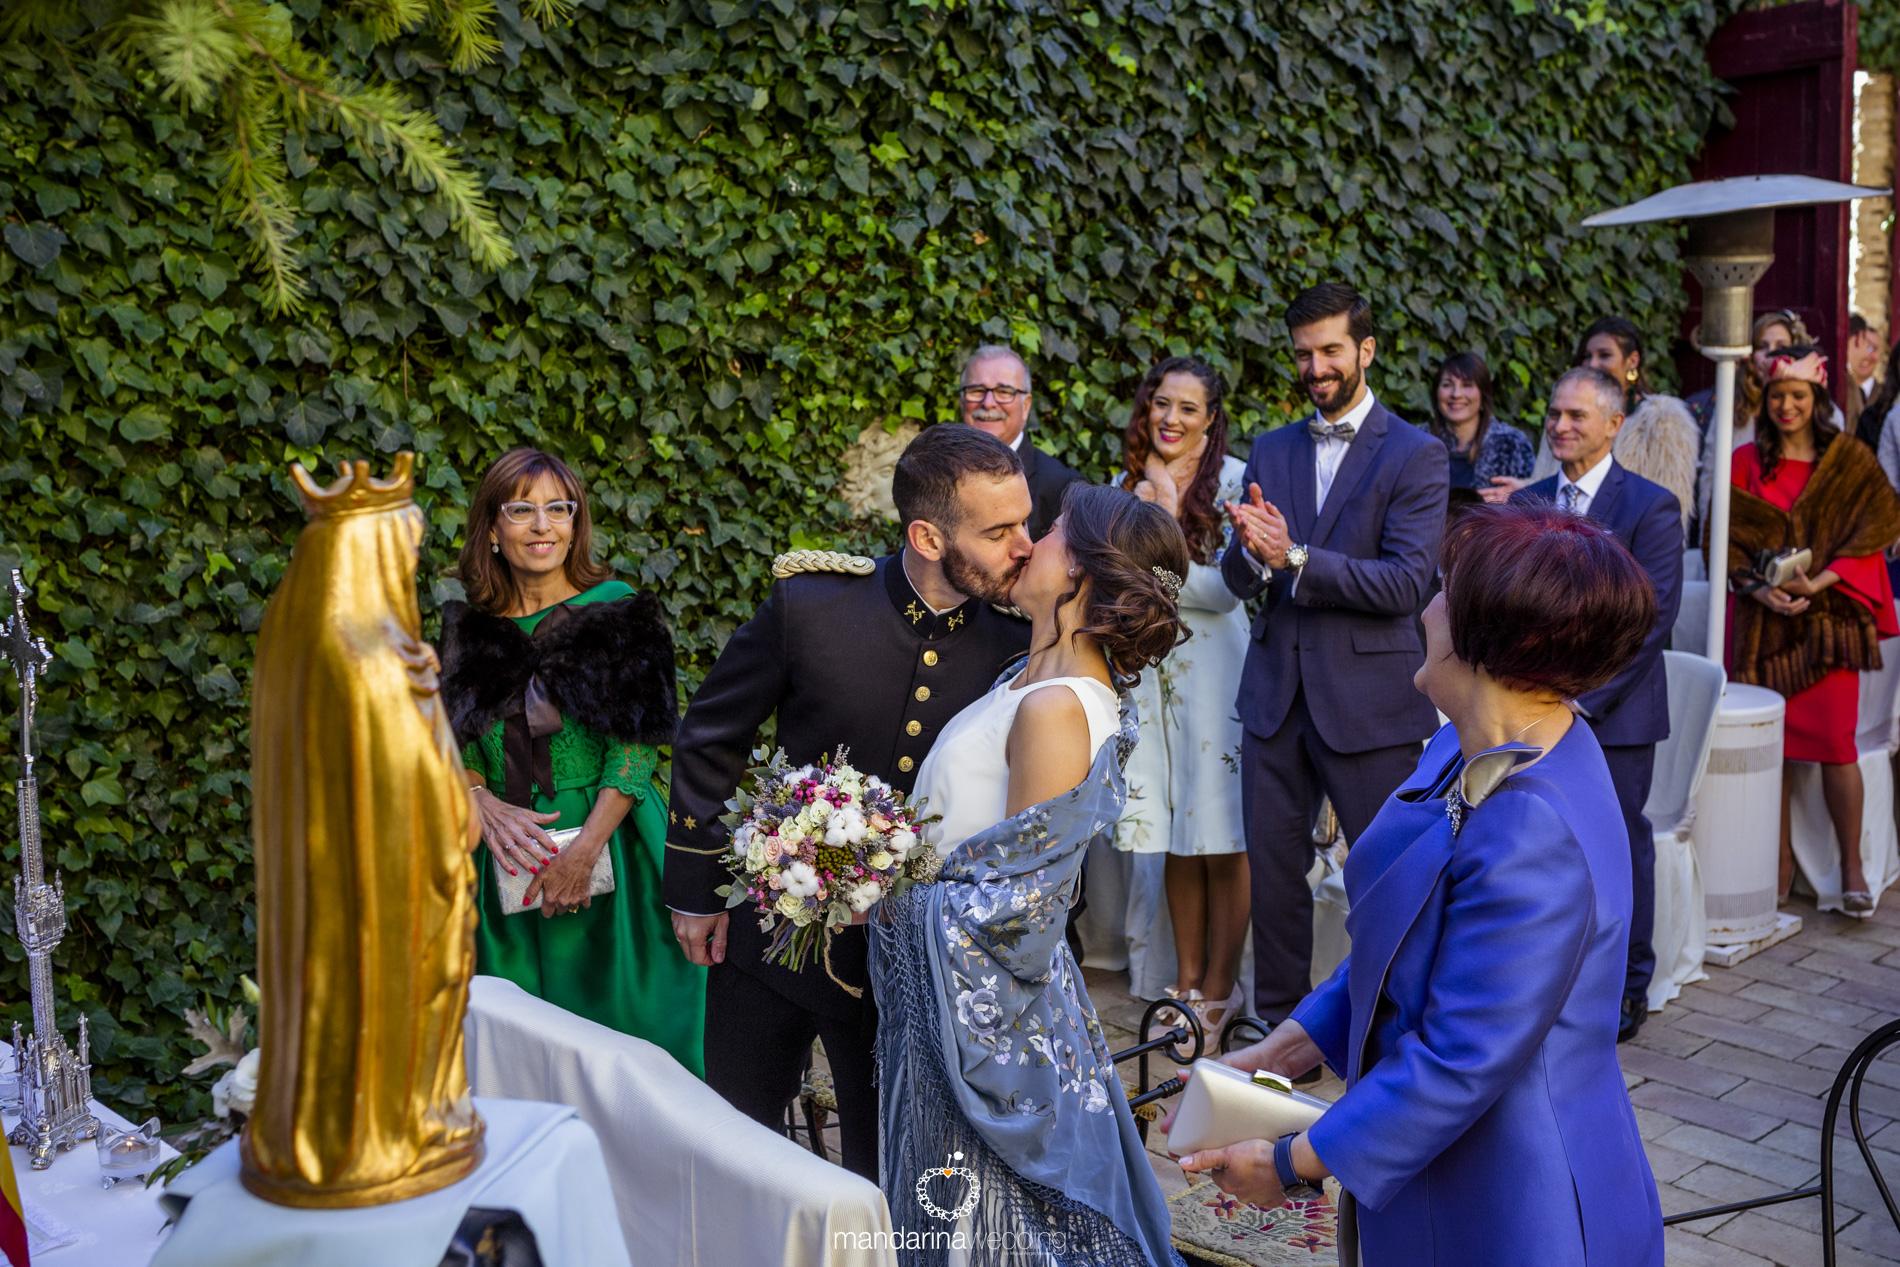 mandarina wedding, fotografos de boda, fotografo boda soria, fotografo boda barcelona, fotografo boda Madrid, fotógrafo boda lerida_20